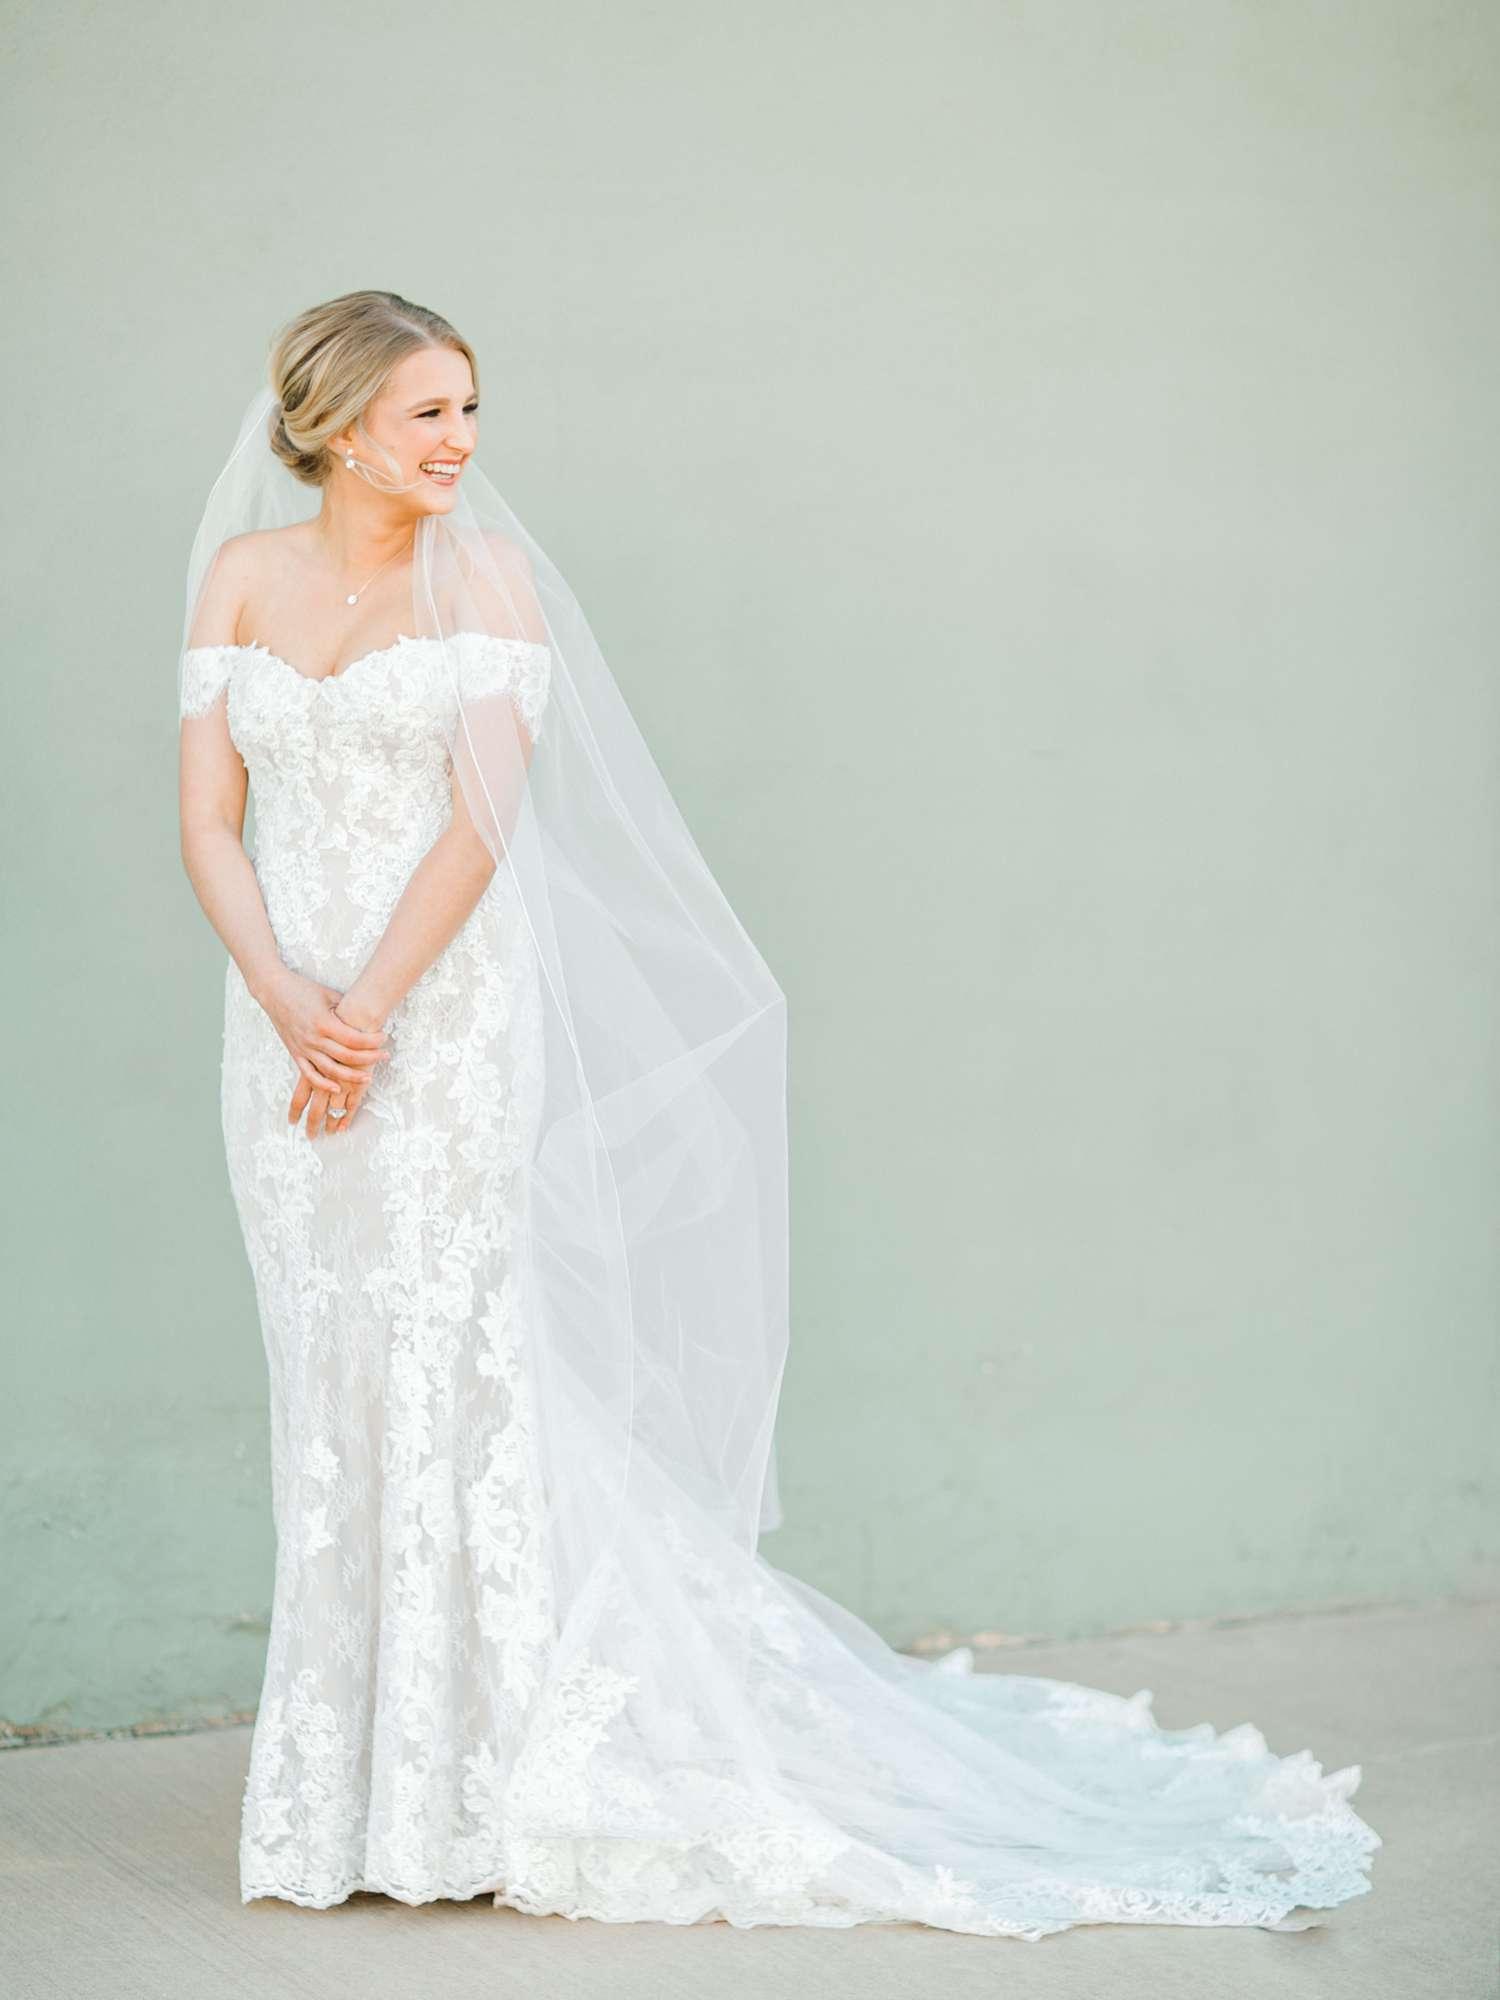 MORGAN+BOONE+BRIDALS+WEDDING+PHOTOGRAPHER_0026.jpg